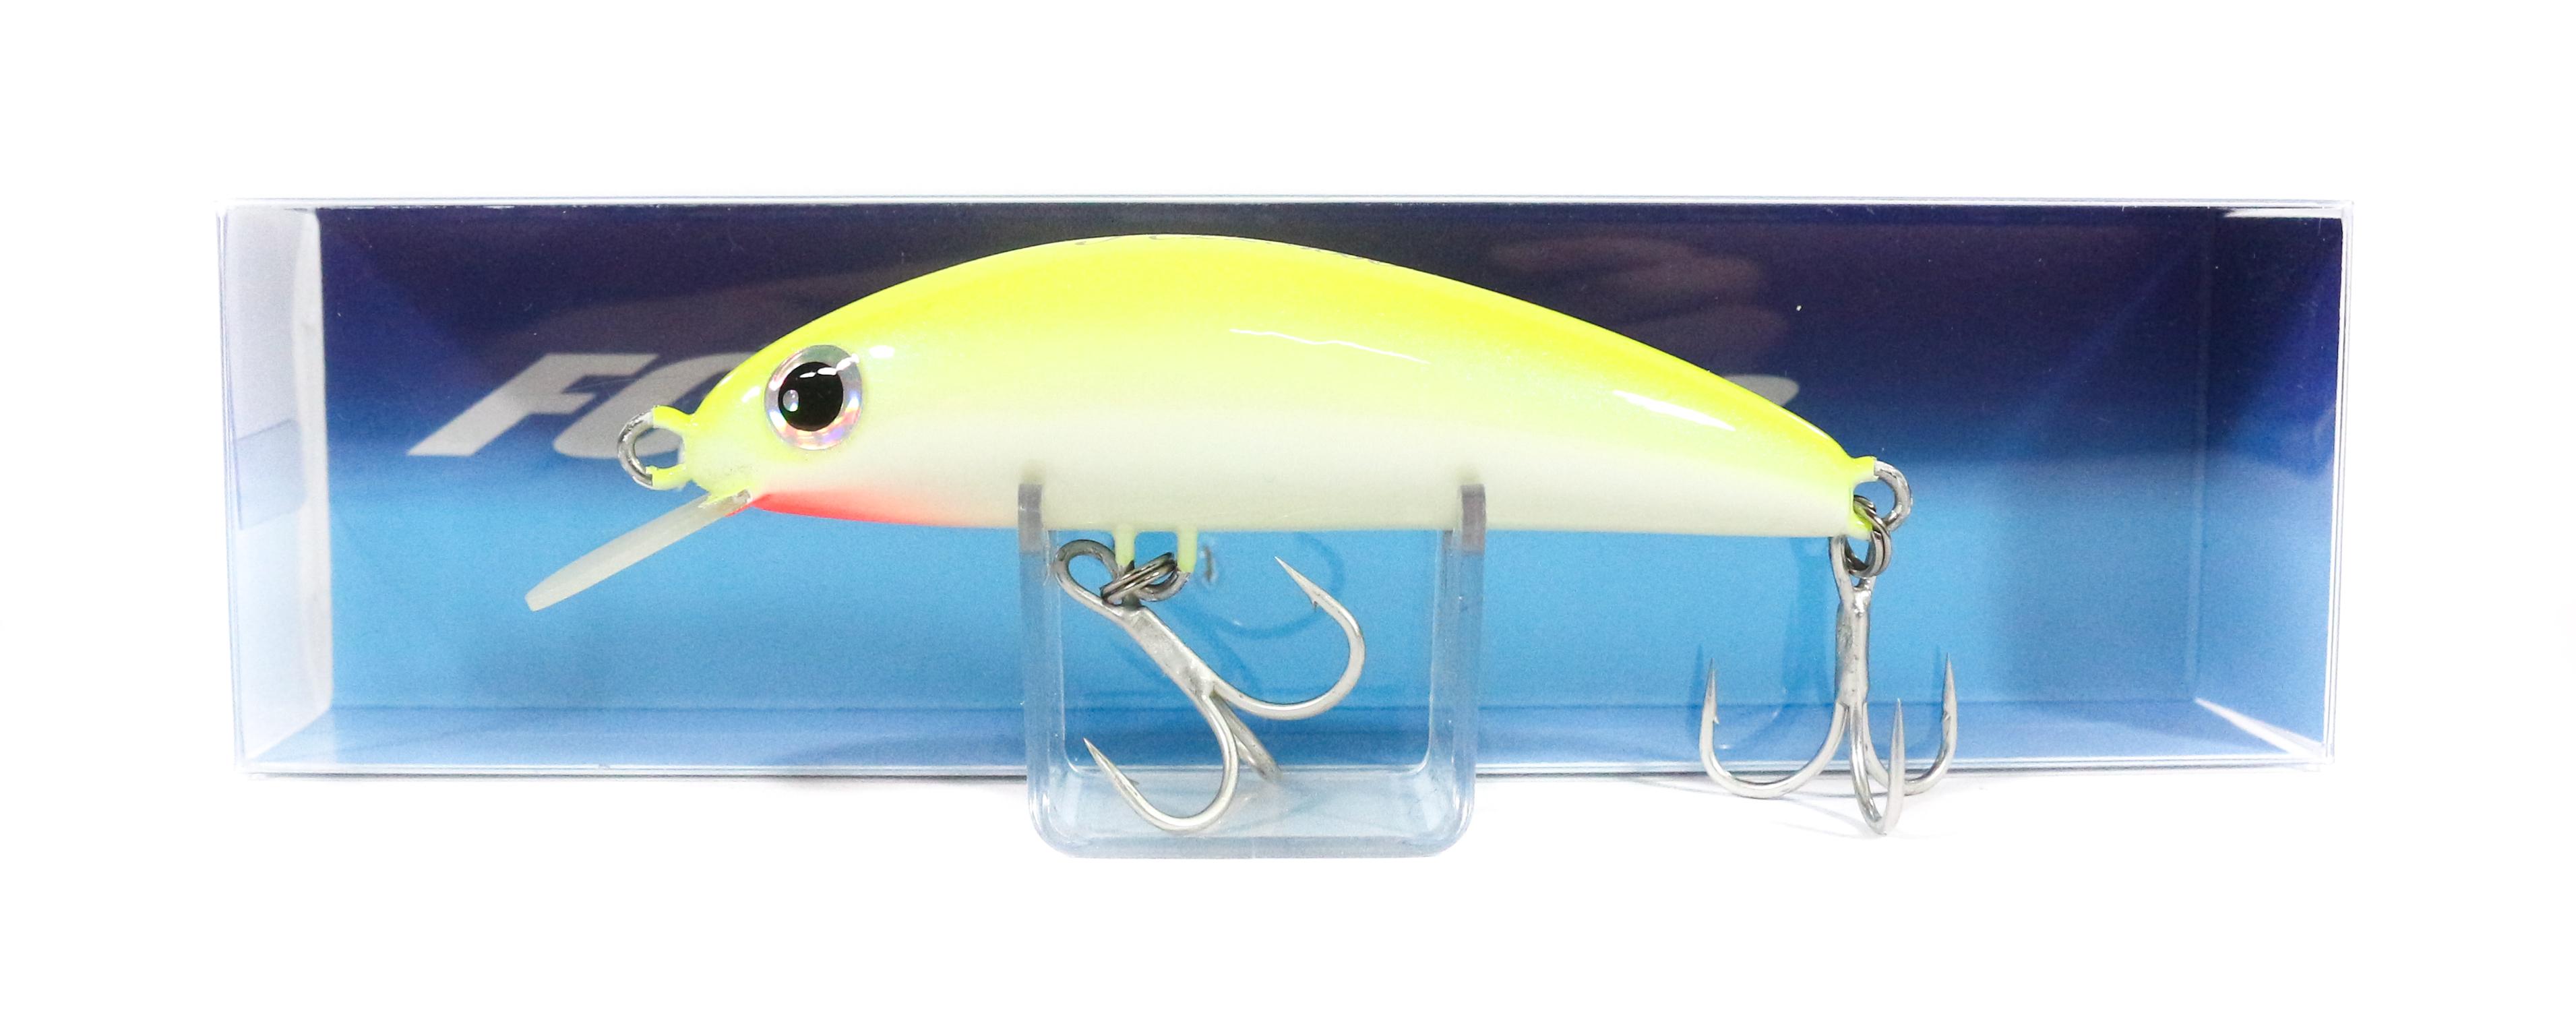 Sale FCL Labo Lure HKTS 82S Sinking Lure 18 grams CH (3368)